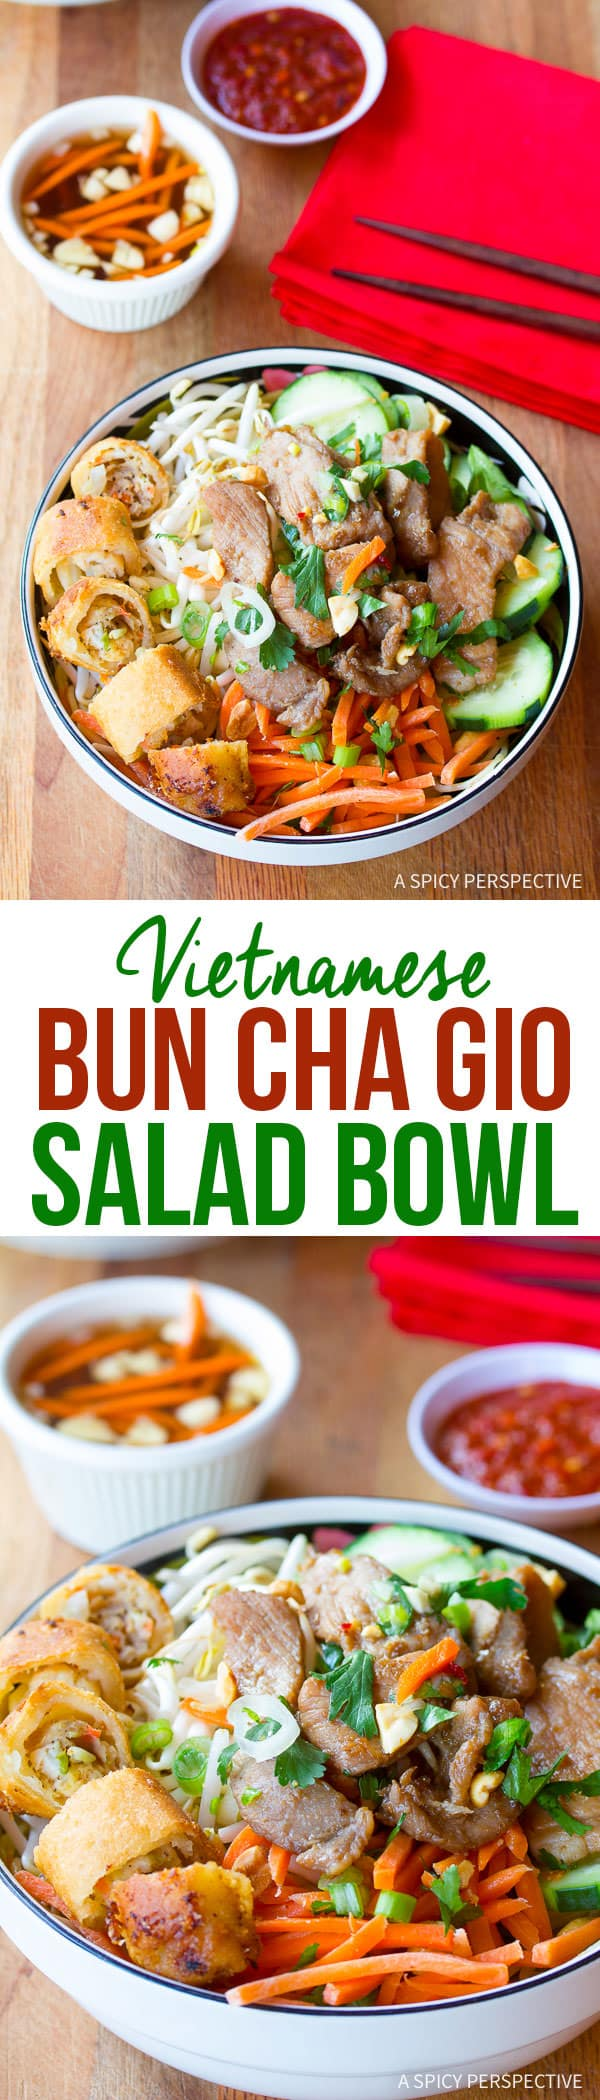 Healthy Vietnamese Bun Cha Gio Recipe (Gluten Free!) | ASpicyPerspective.com